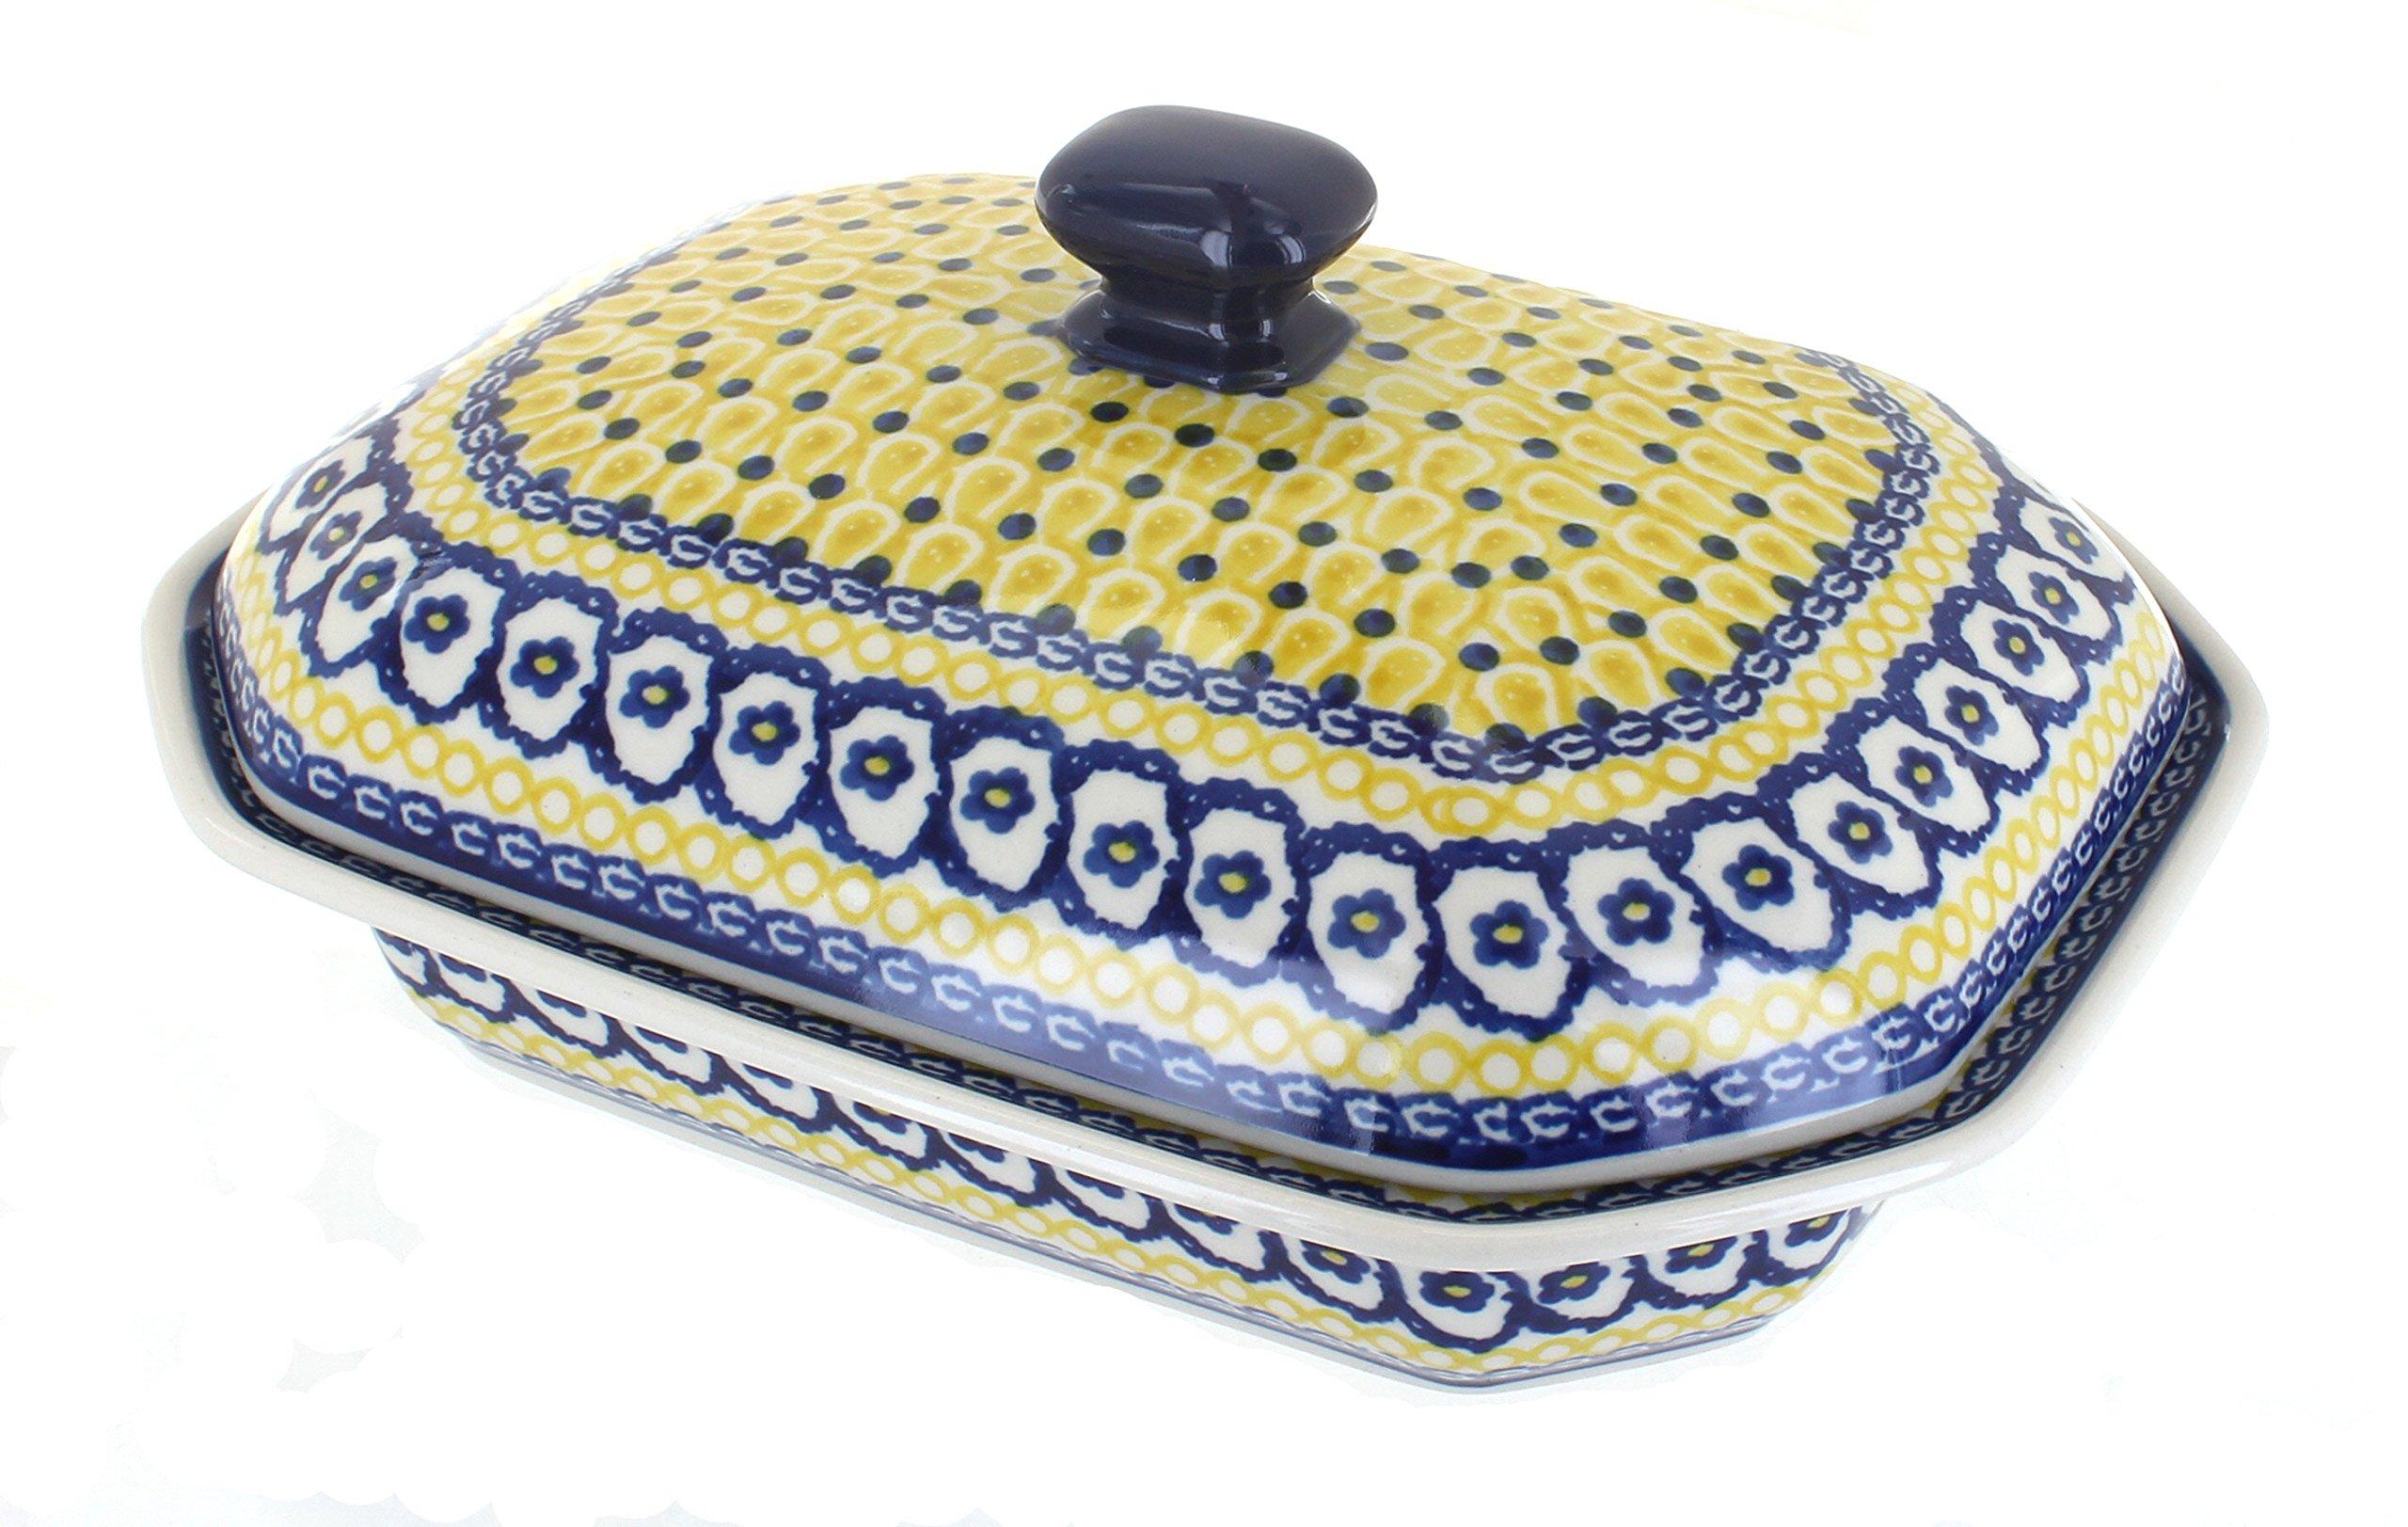 Polish Pottery Saffron Medium Covered Baking Dish by Polmedia Polish Pottery